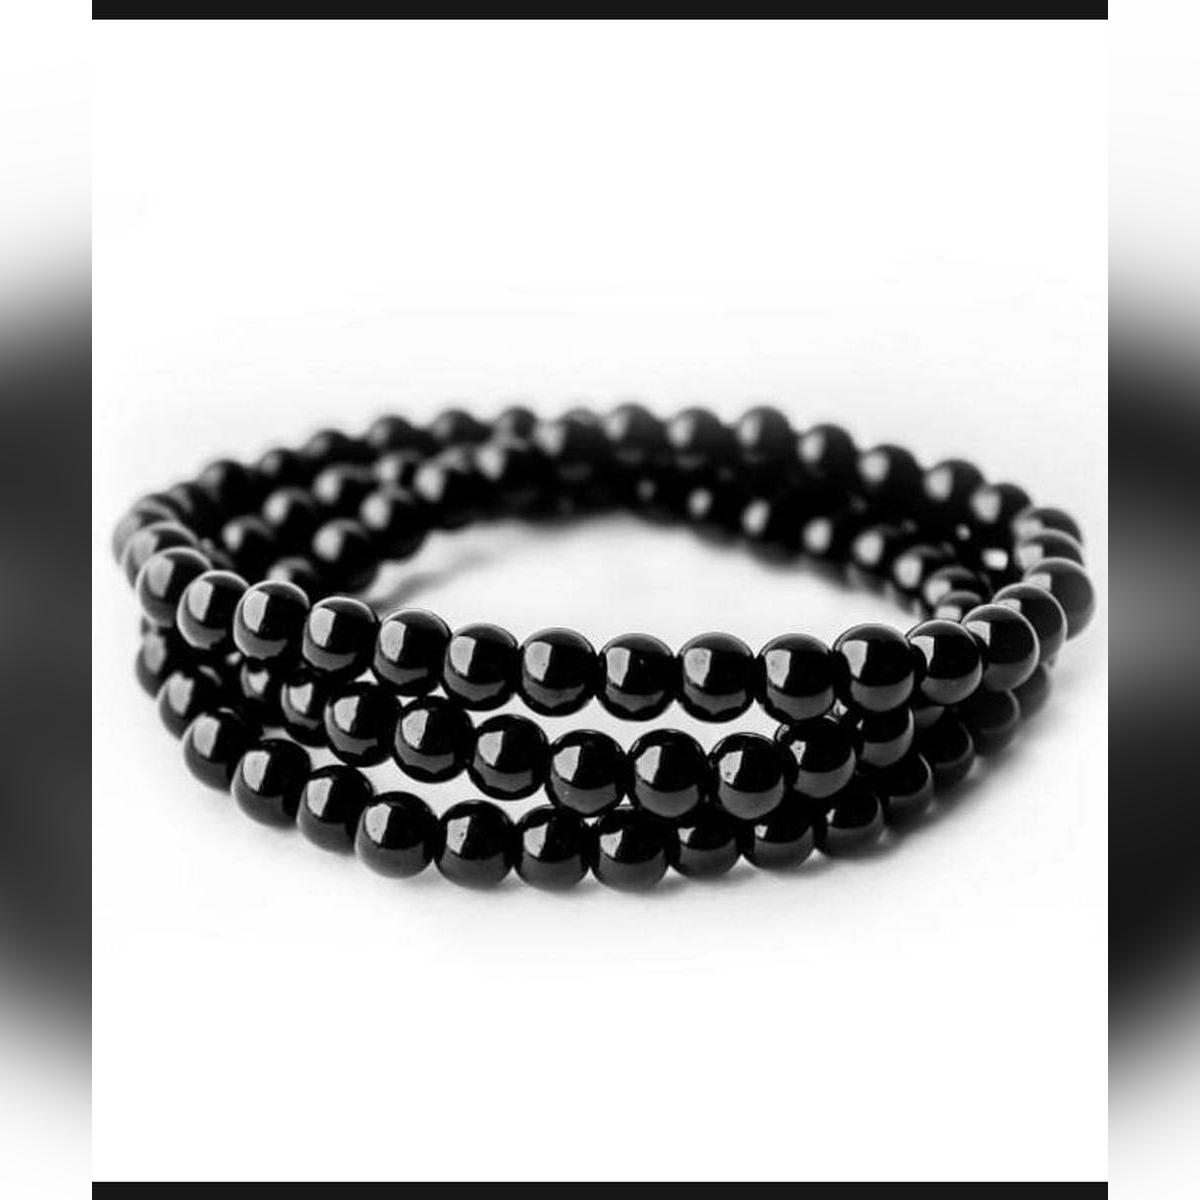 Stylish Multilayer 4 Pcs Leather Bracelet with Zinc Alloy Charms wooden Beads Bracelets for Men Unisex Punk Wristbands